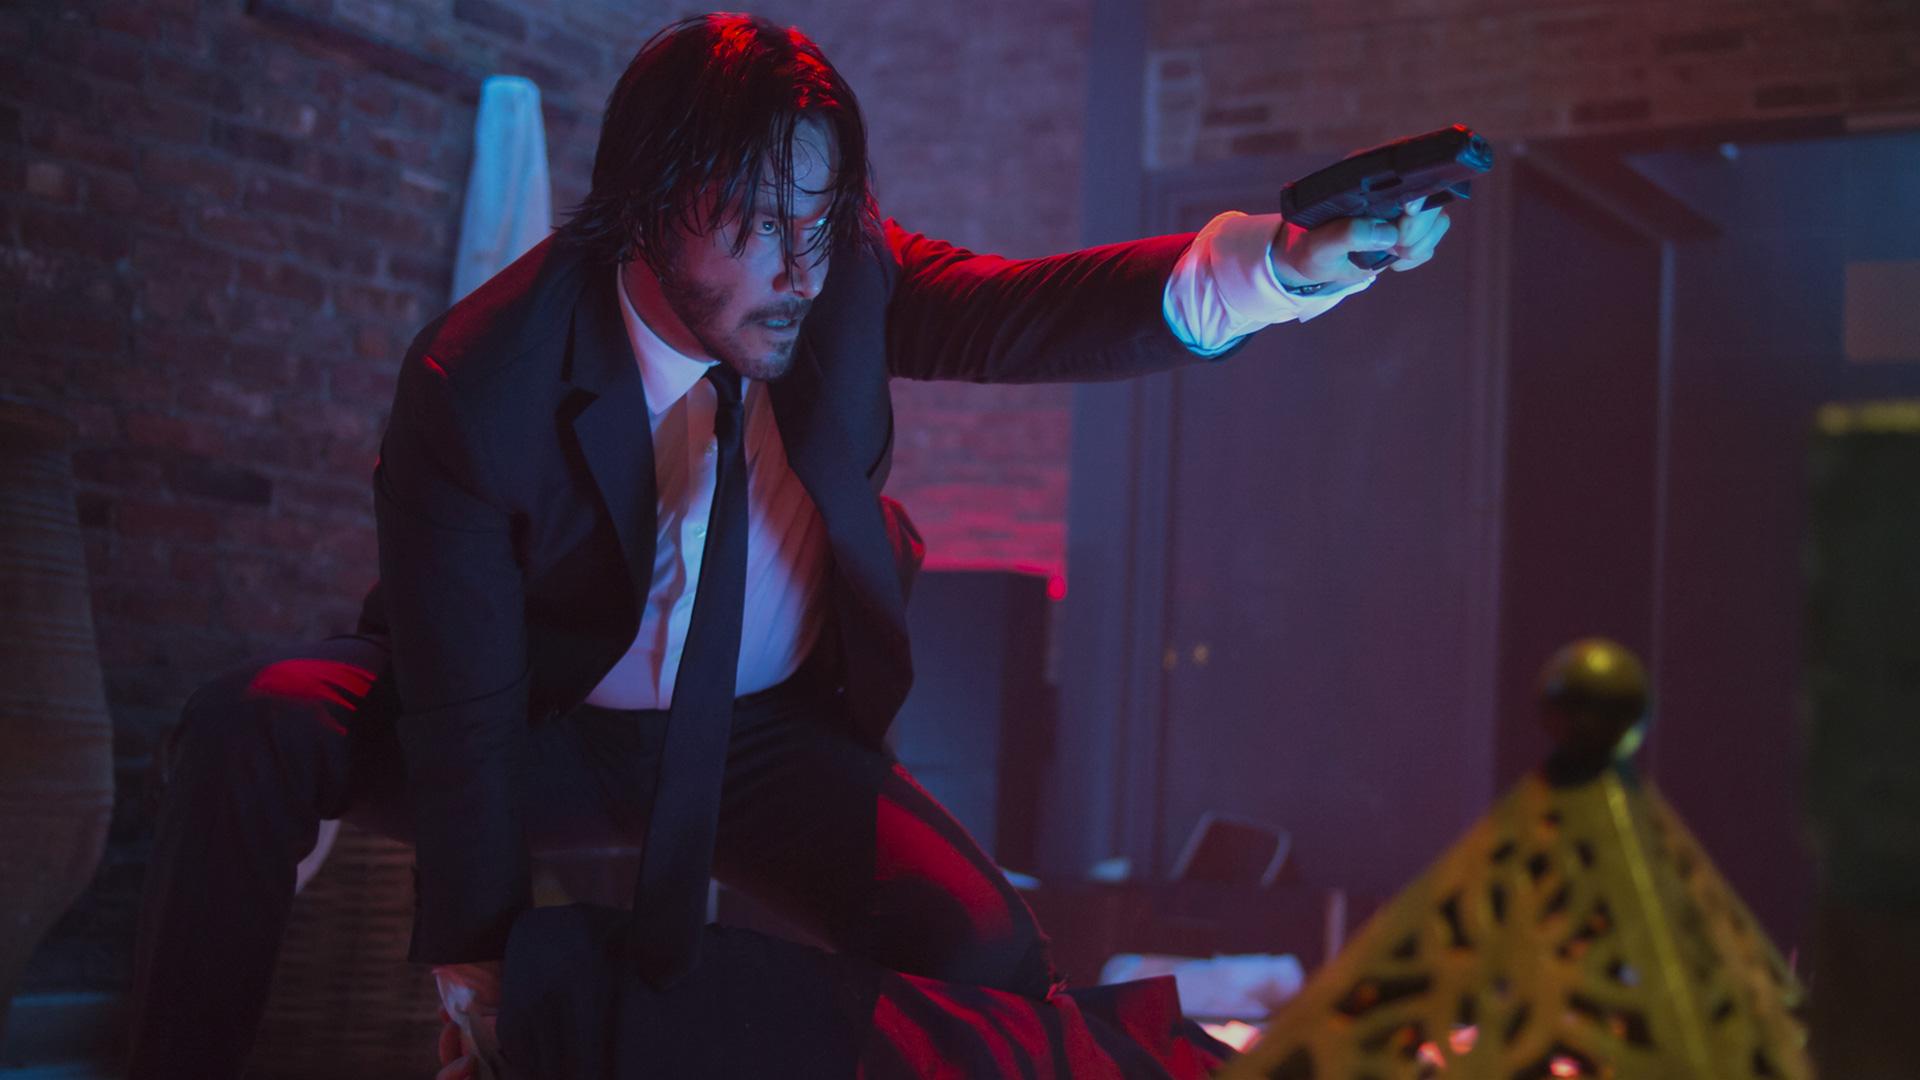 John Wick Keanu Reeves Ian Mcshane Lance Reddick Ruby